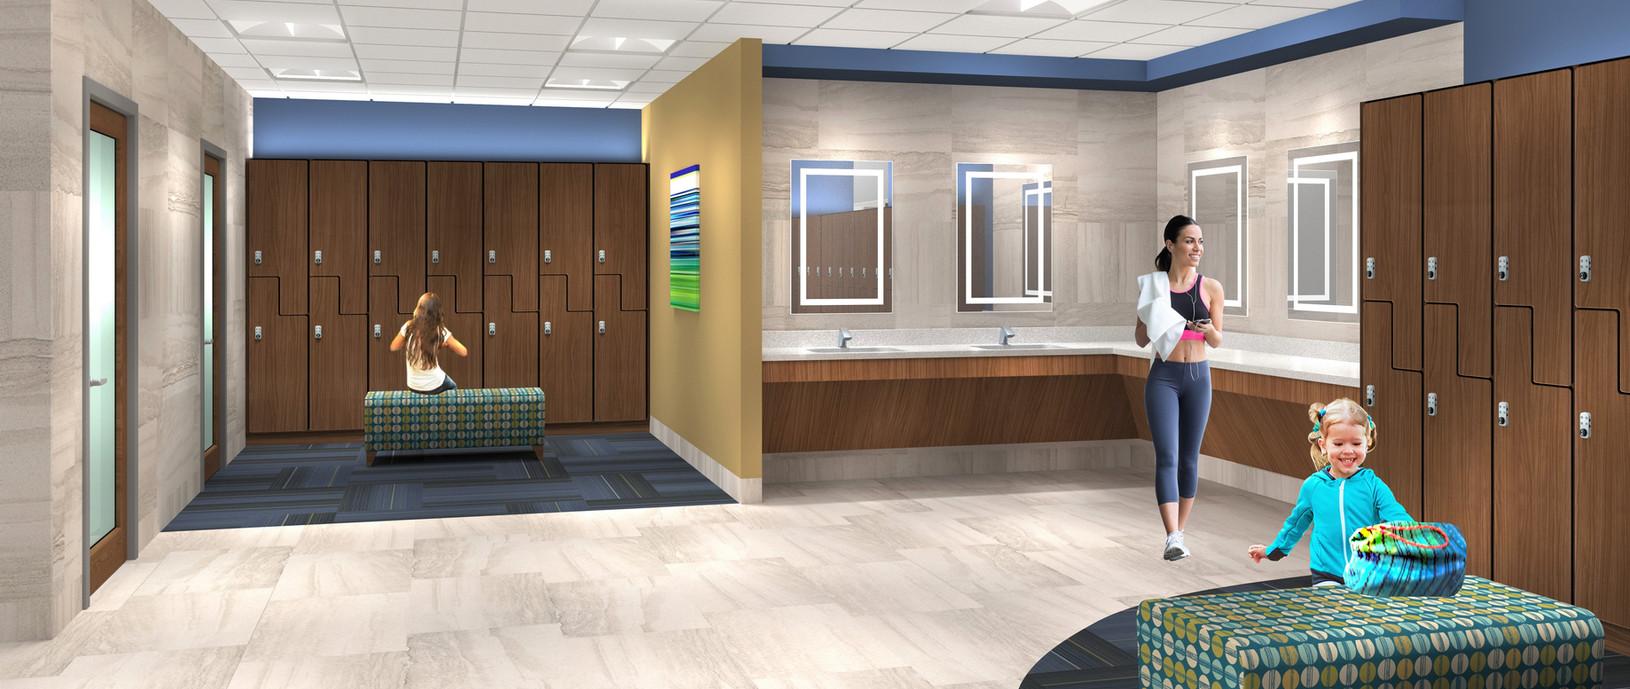 10-Rendering - Family locker room.jpg